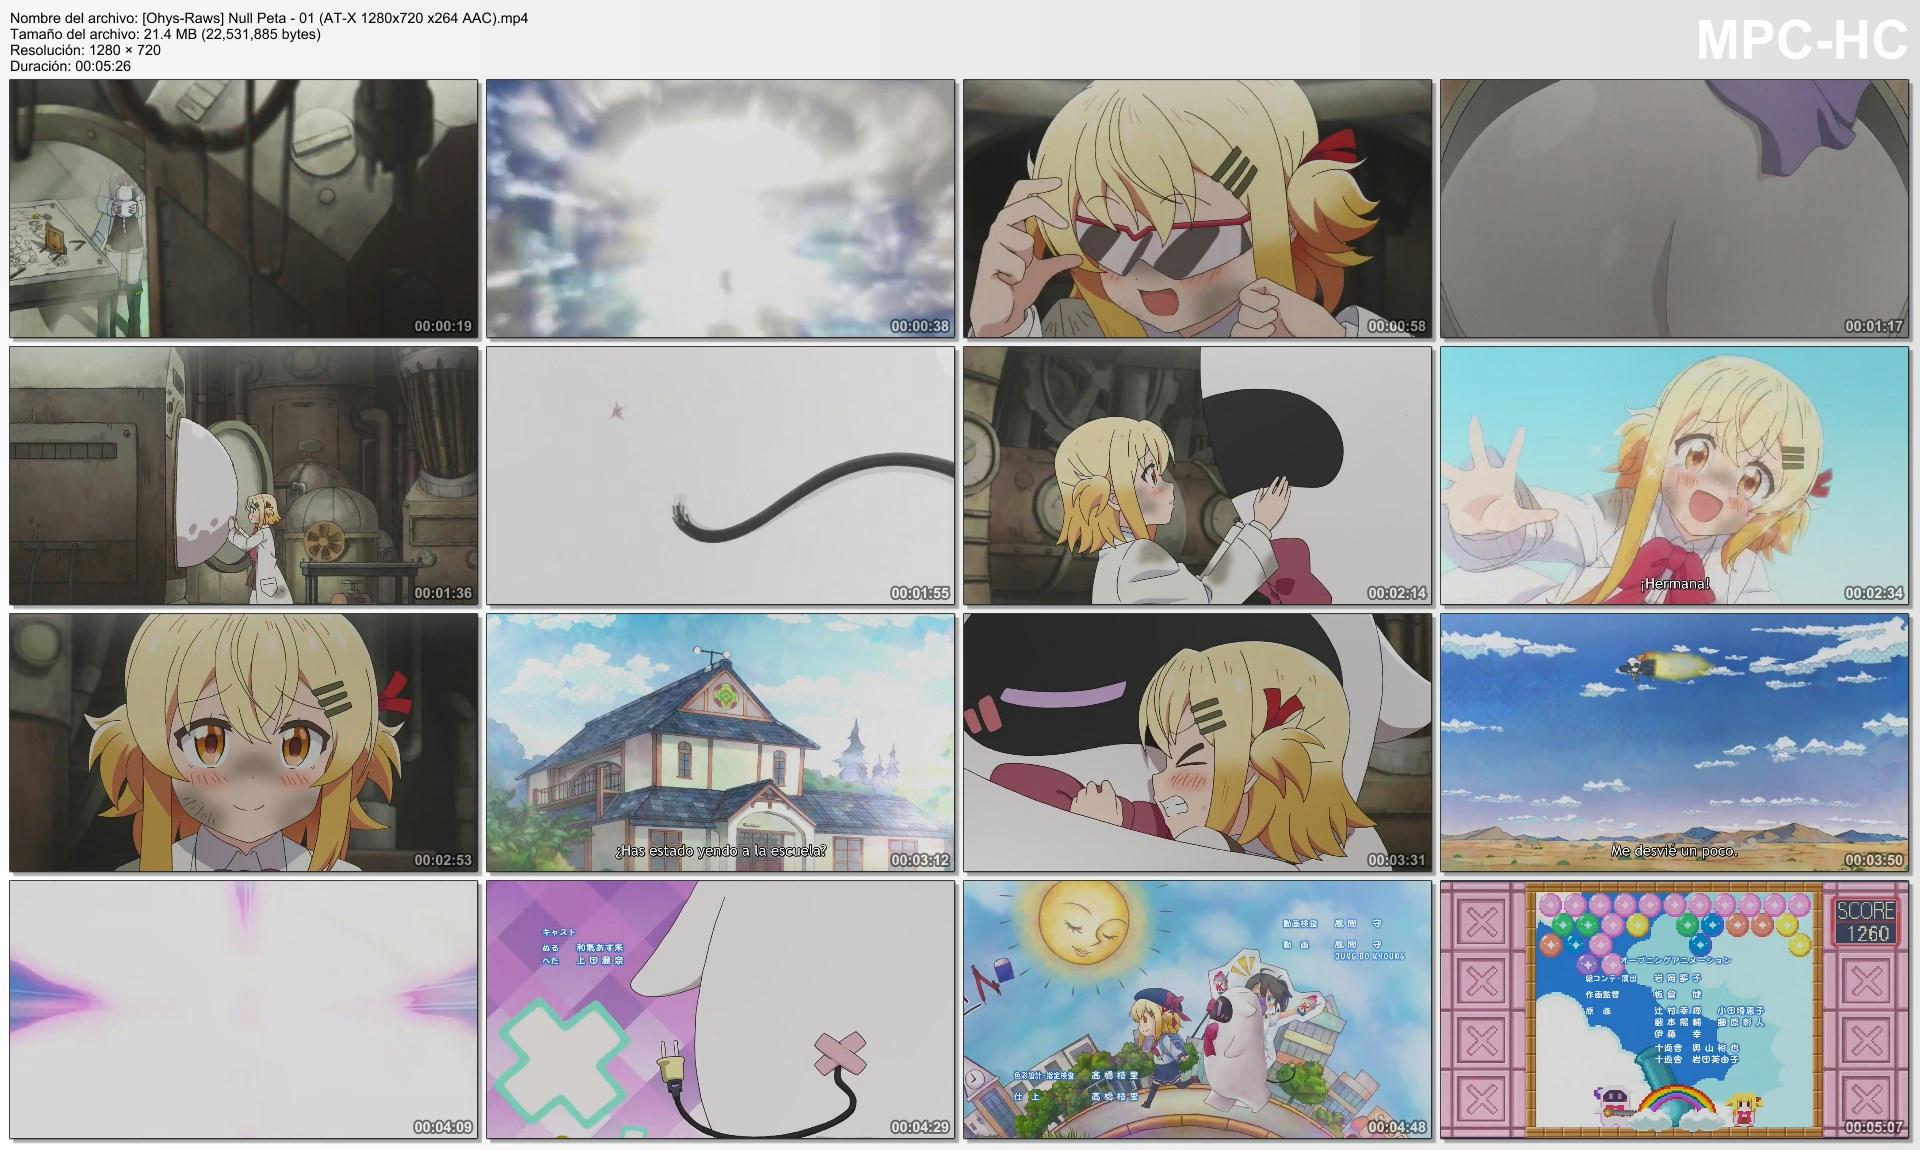 rk3s3bh0100h6b5zg - Null & Peta [12/12 (OVA)] [Ligero] [MEGA] (Finalizado) [2 Servidores] - Anime Ligero [Descargas]